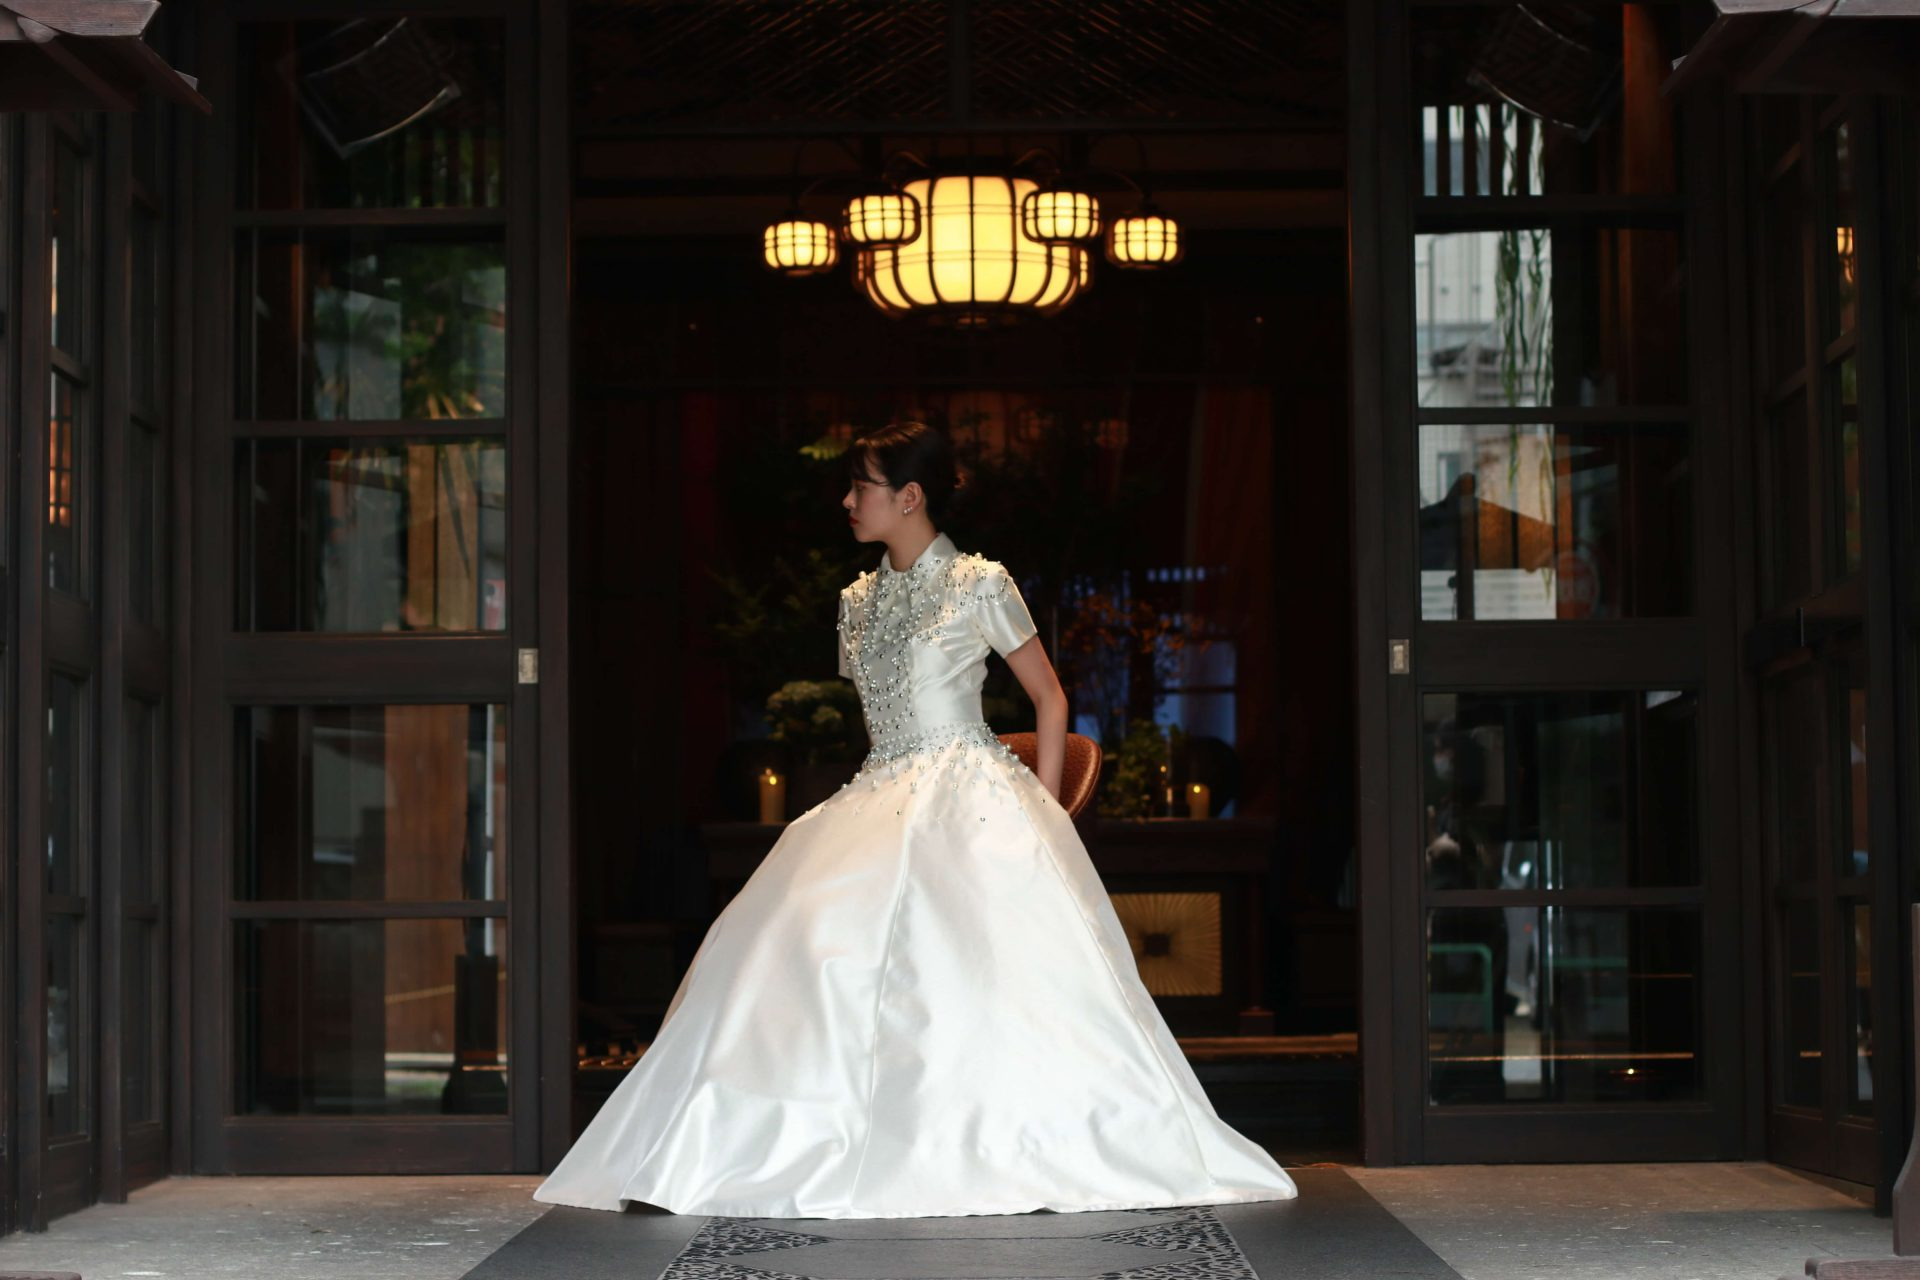 THE KAWABUN NAGOYAでのお式と前撮りにおすすめのVIKTOR&ROLF MARIAGEのウェディングドレス